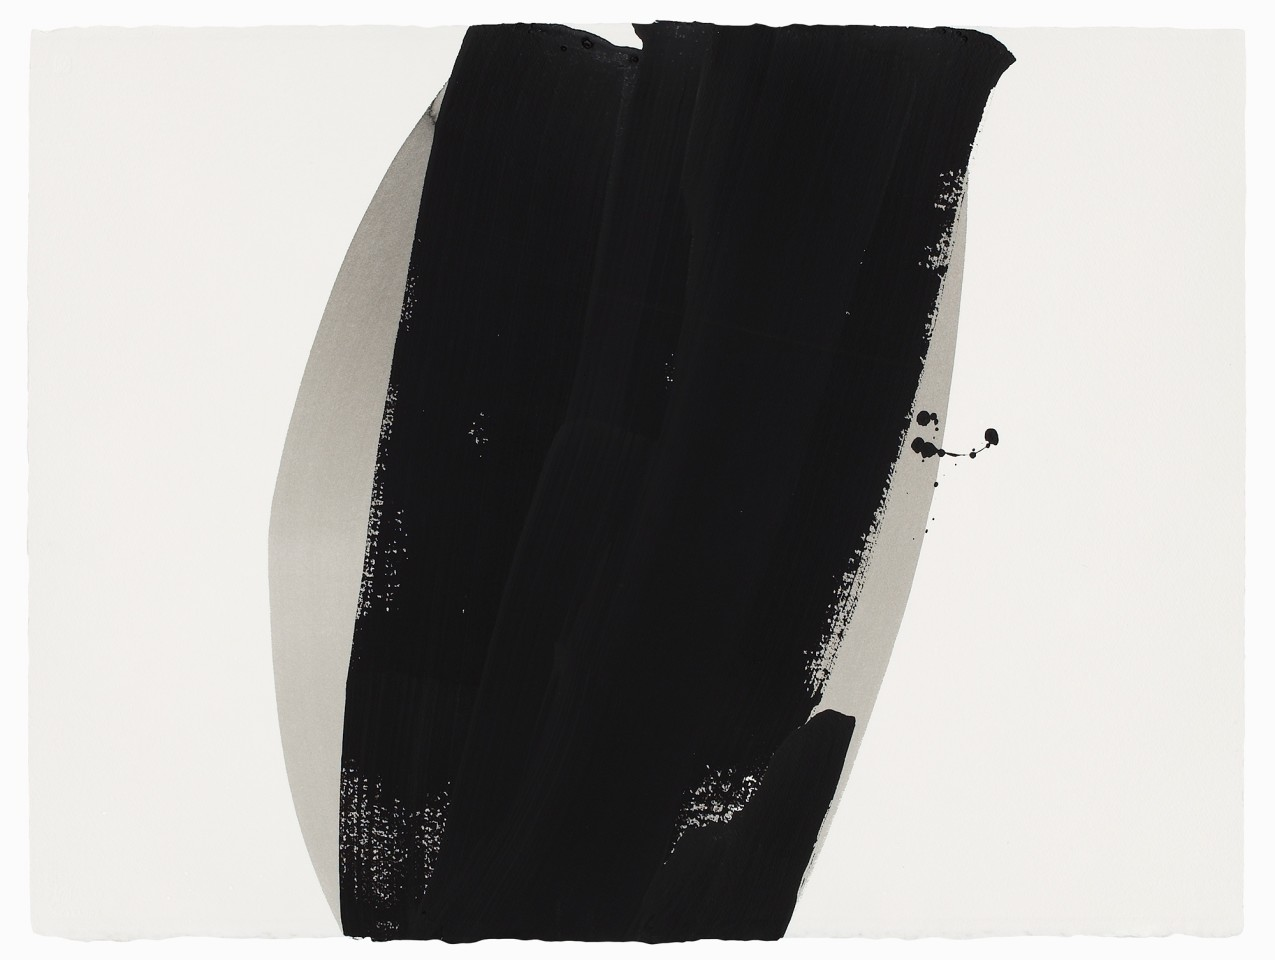 Hiroko Nakajima, #019842  Zusammenfluss A, 2012